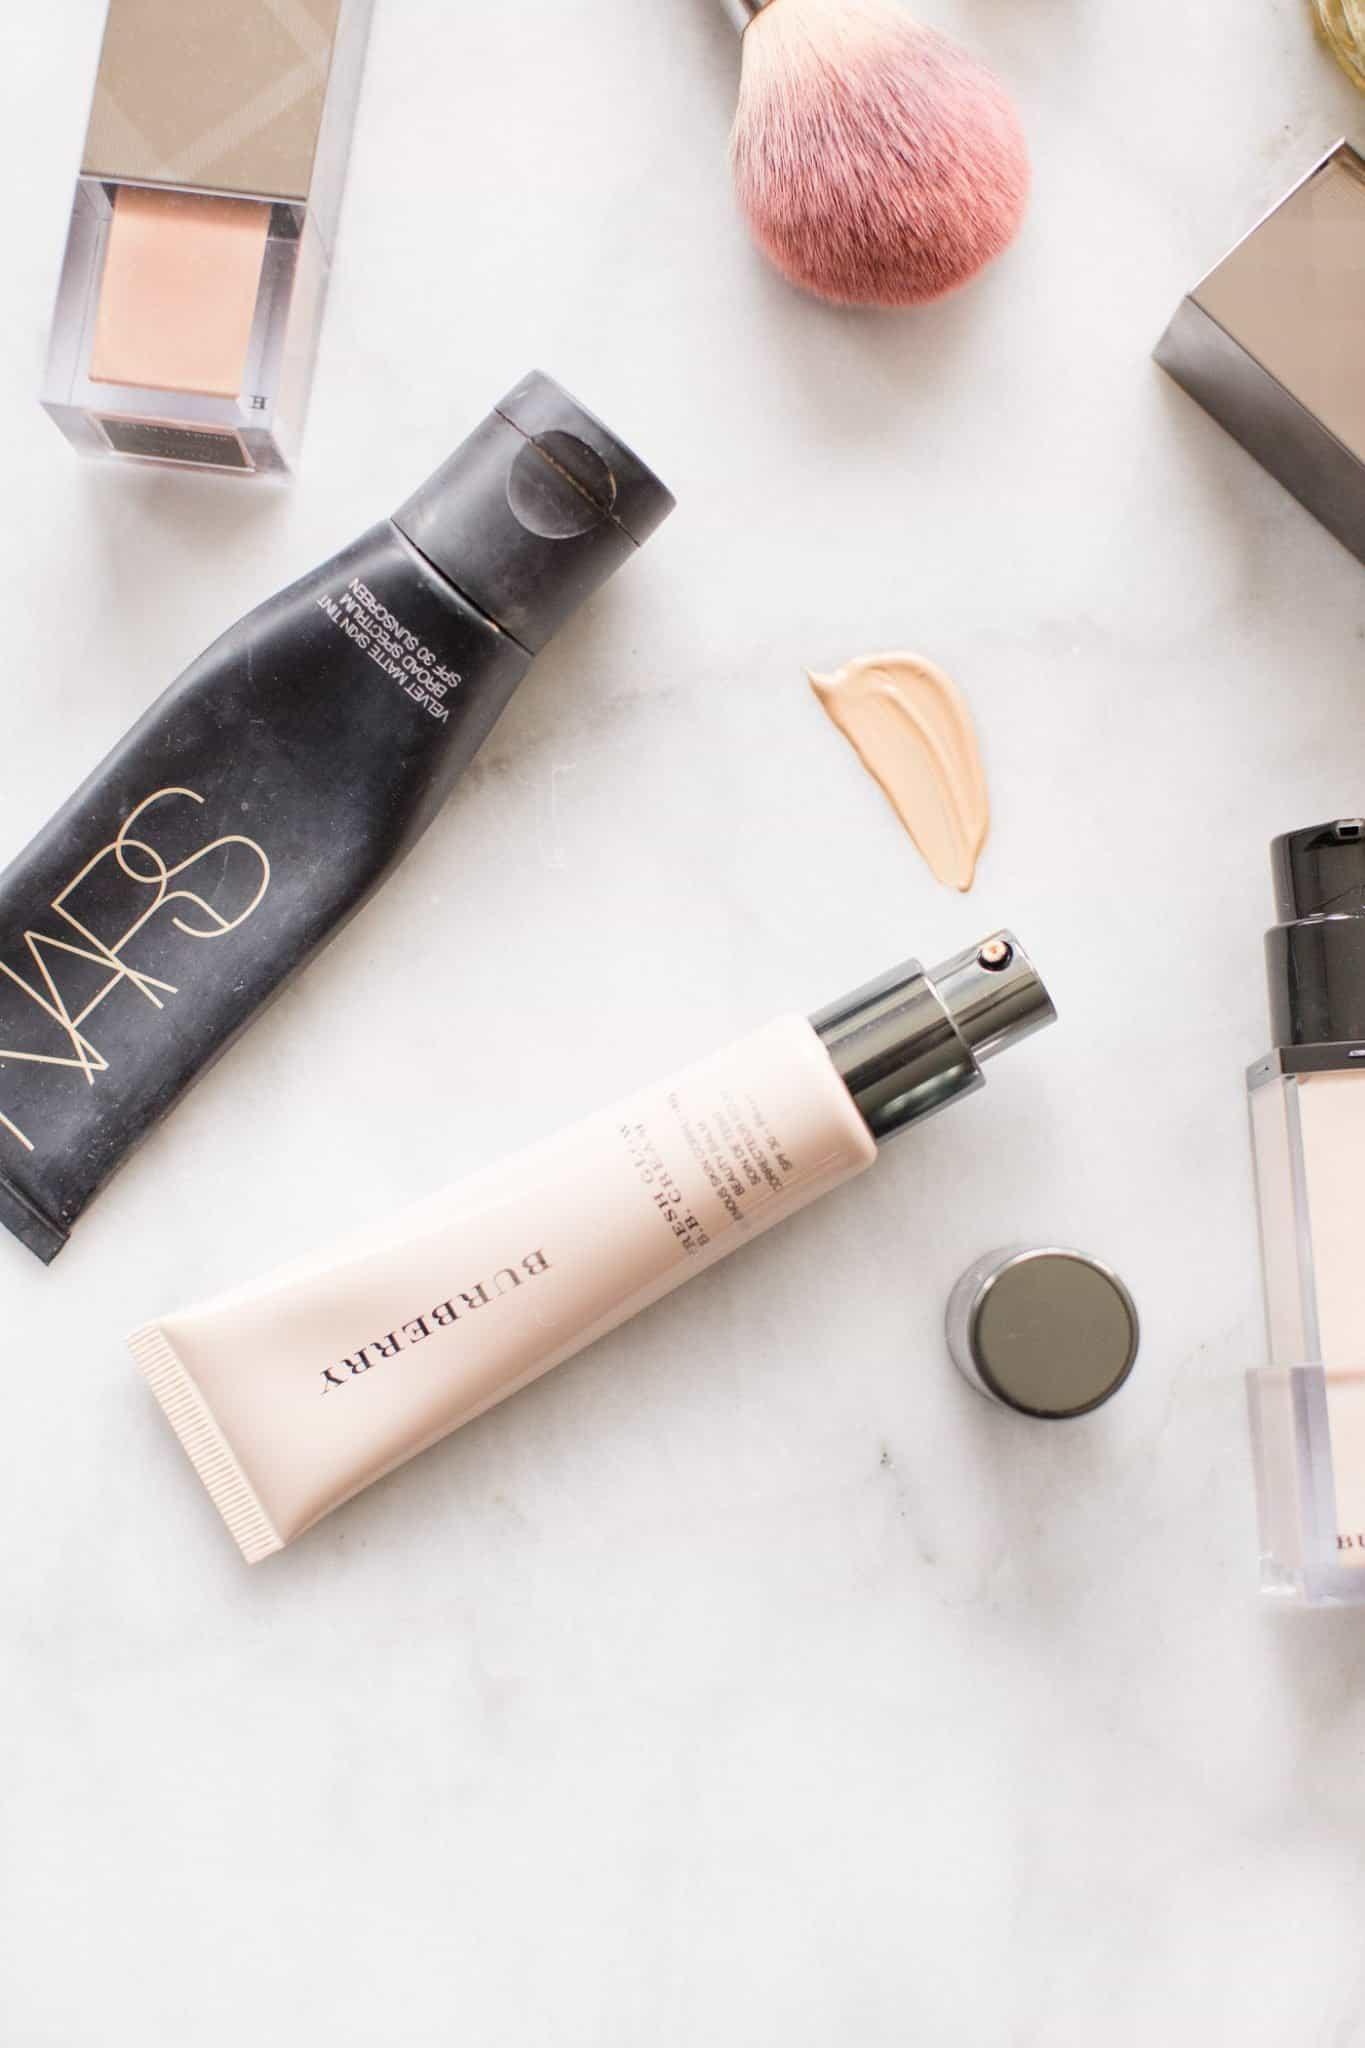 The best lightweight summer foundations, makeup flat lay - My Style Vita @mystylevita